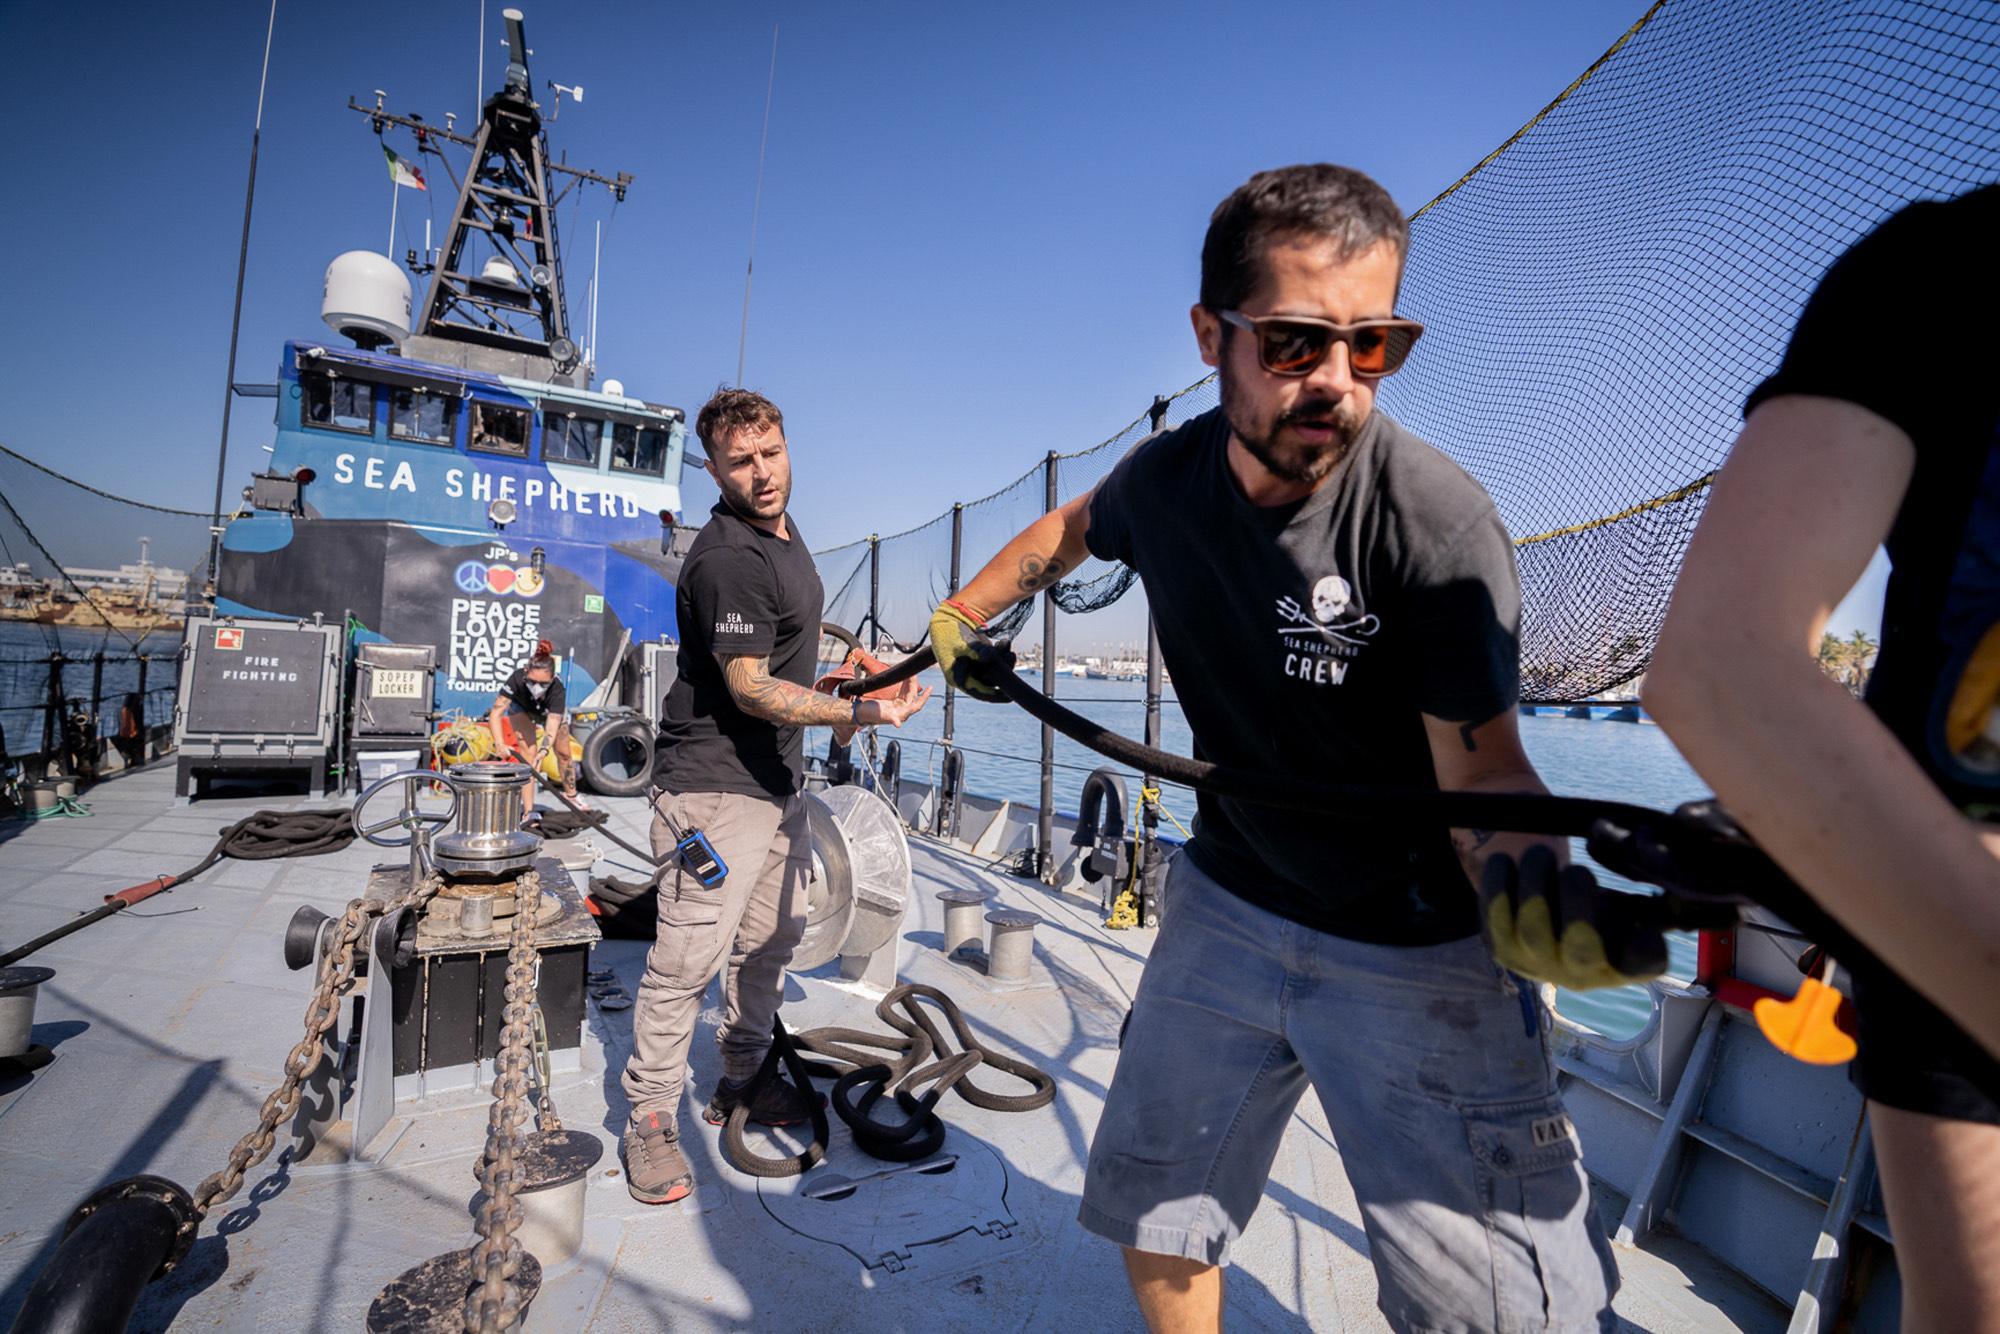 sea-shepherd-crew-pulls-anchor SEA SHEPHERD